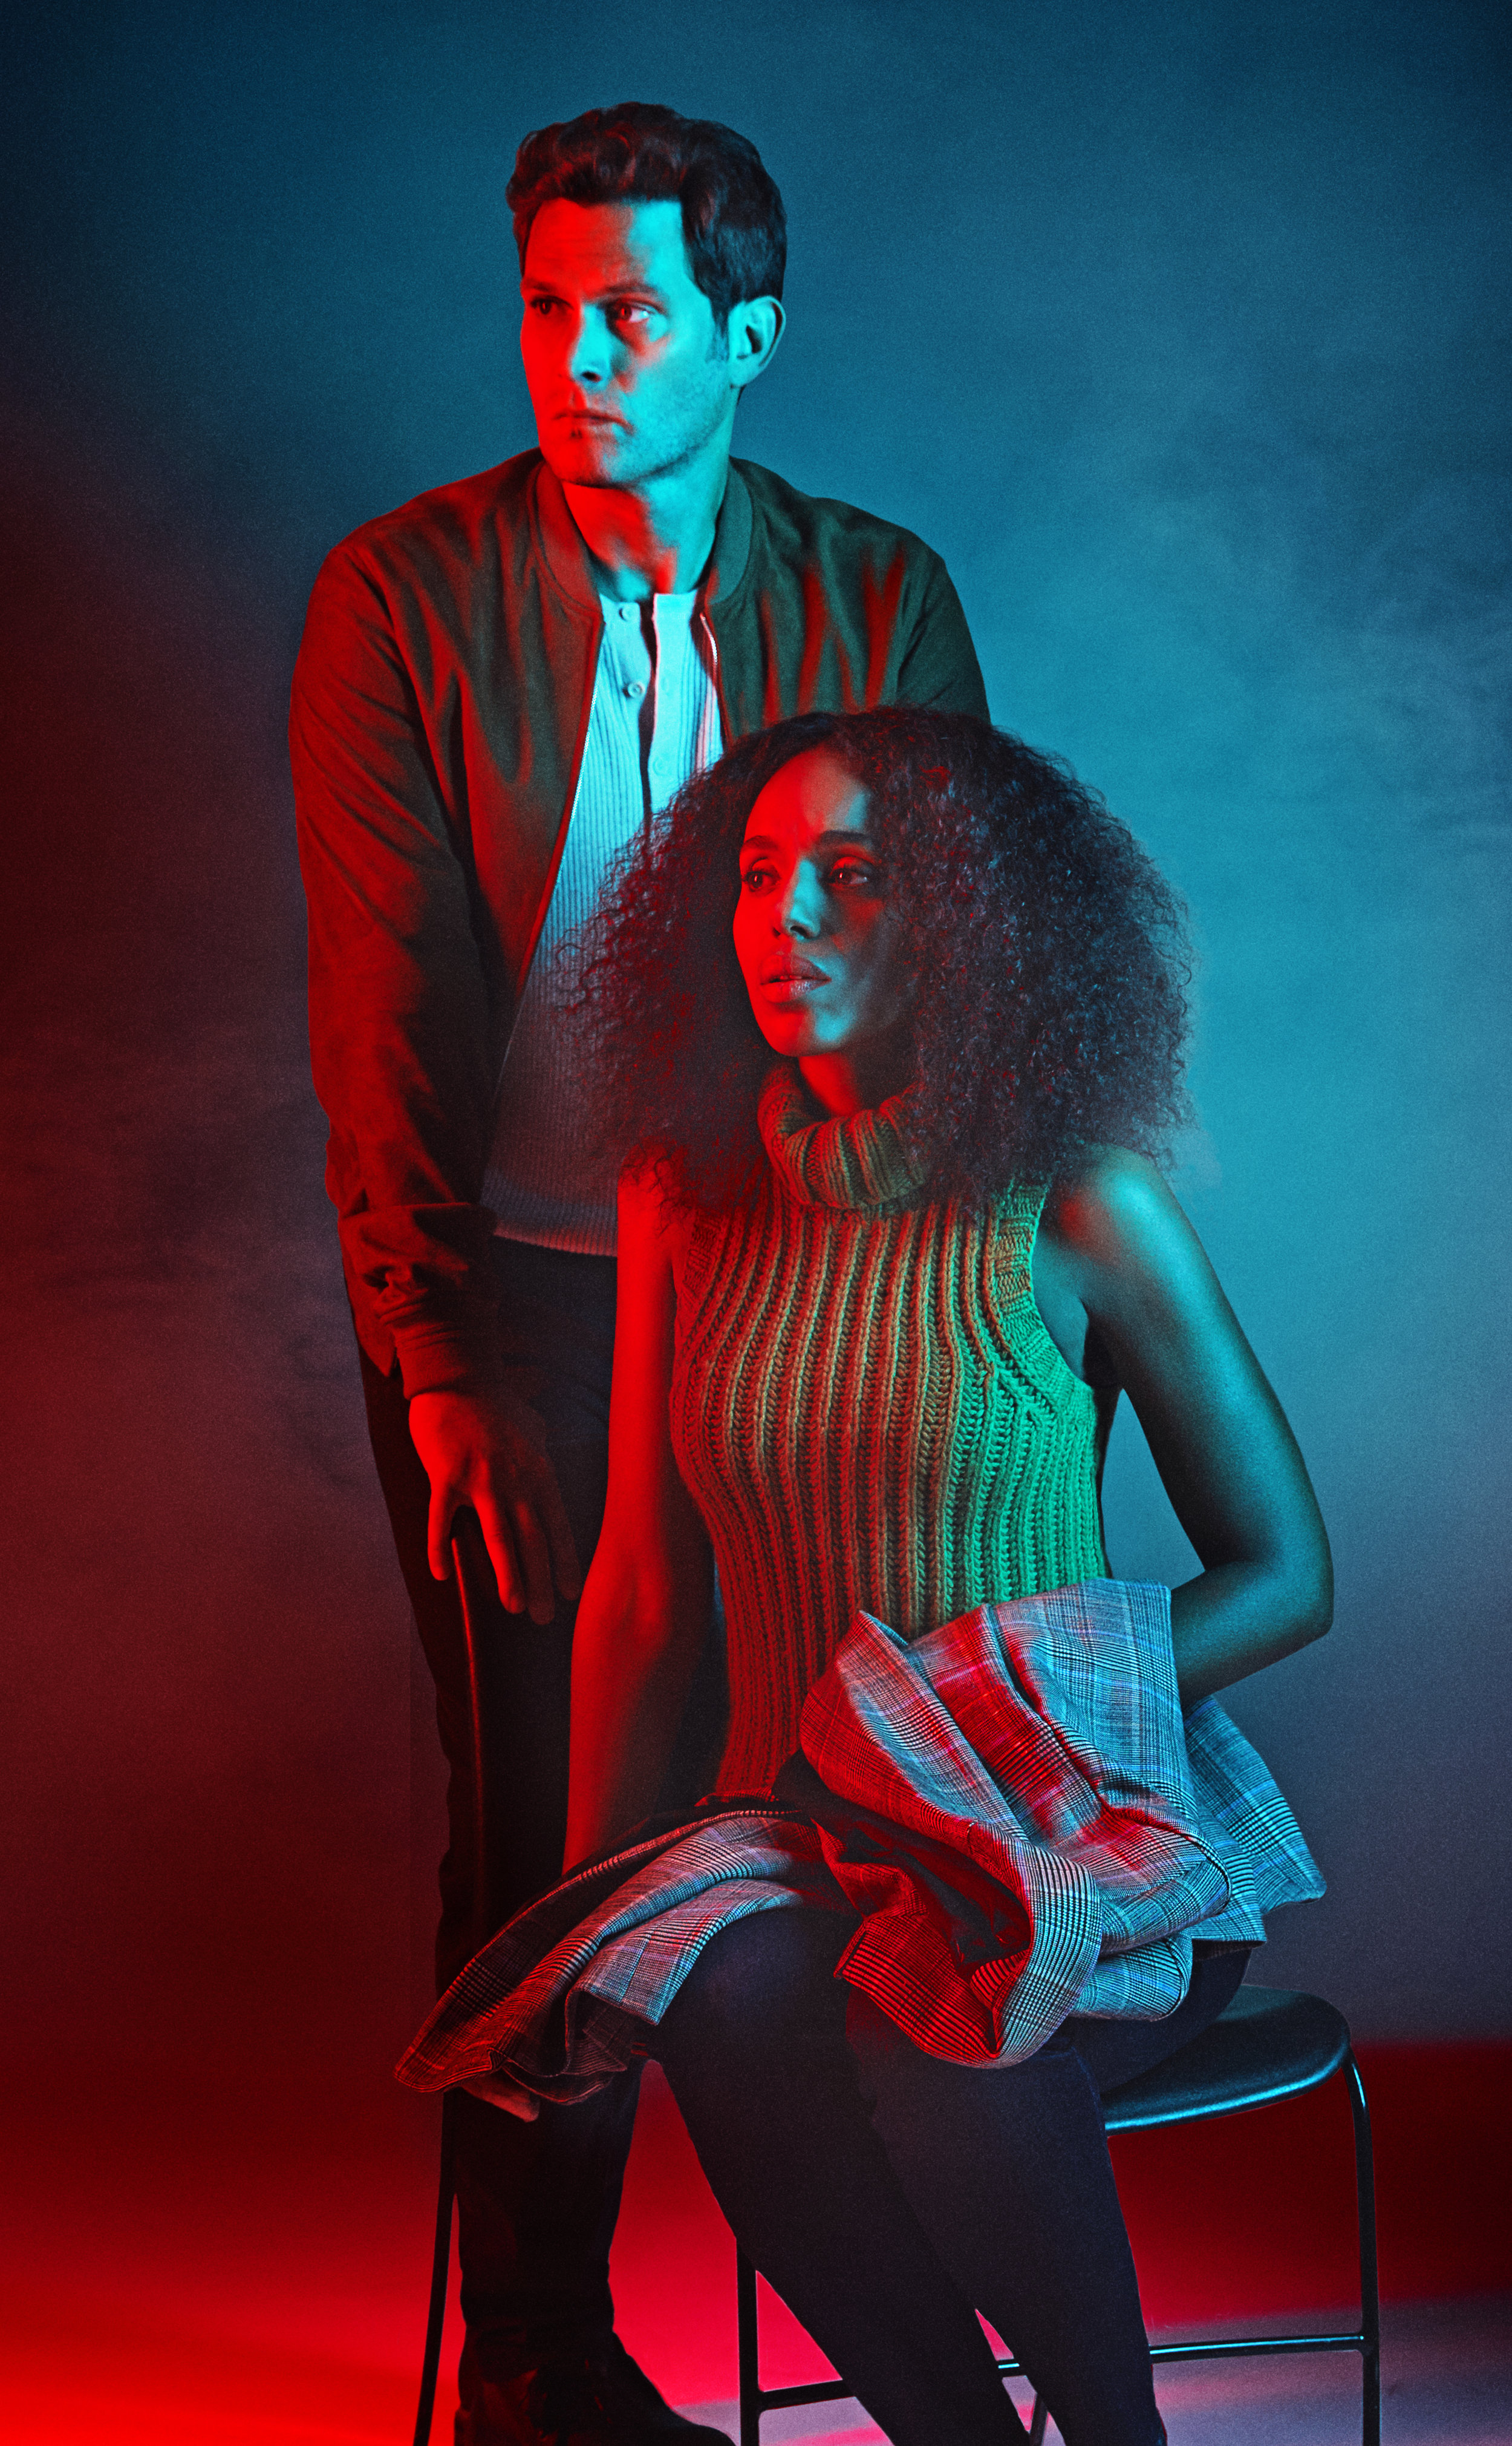 american son/promo + poster